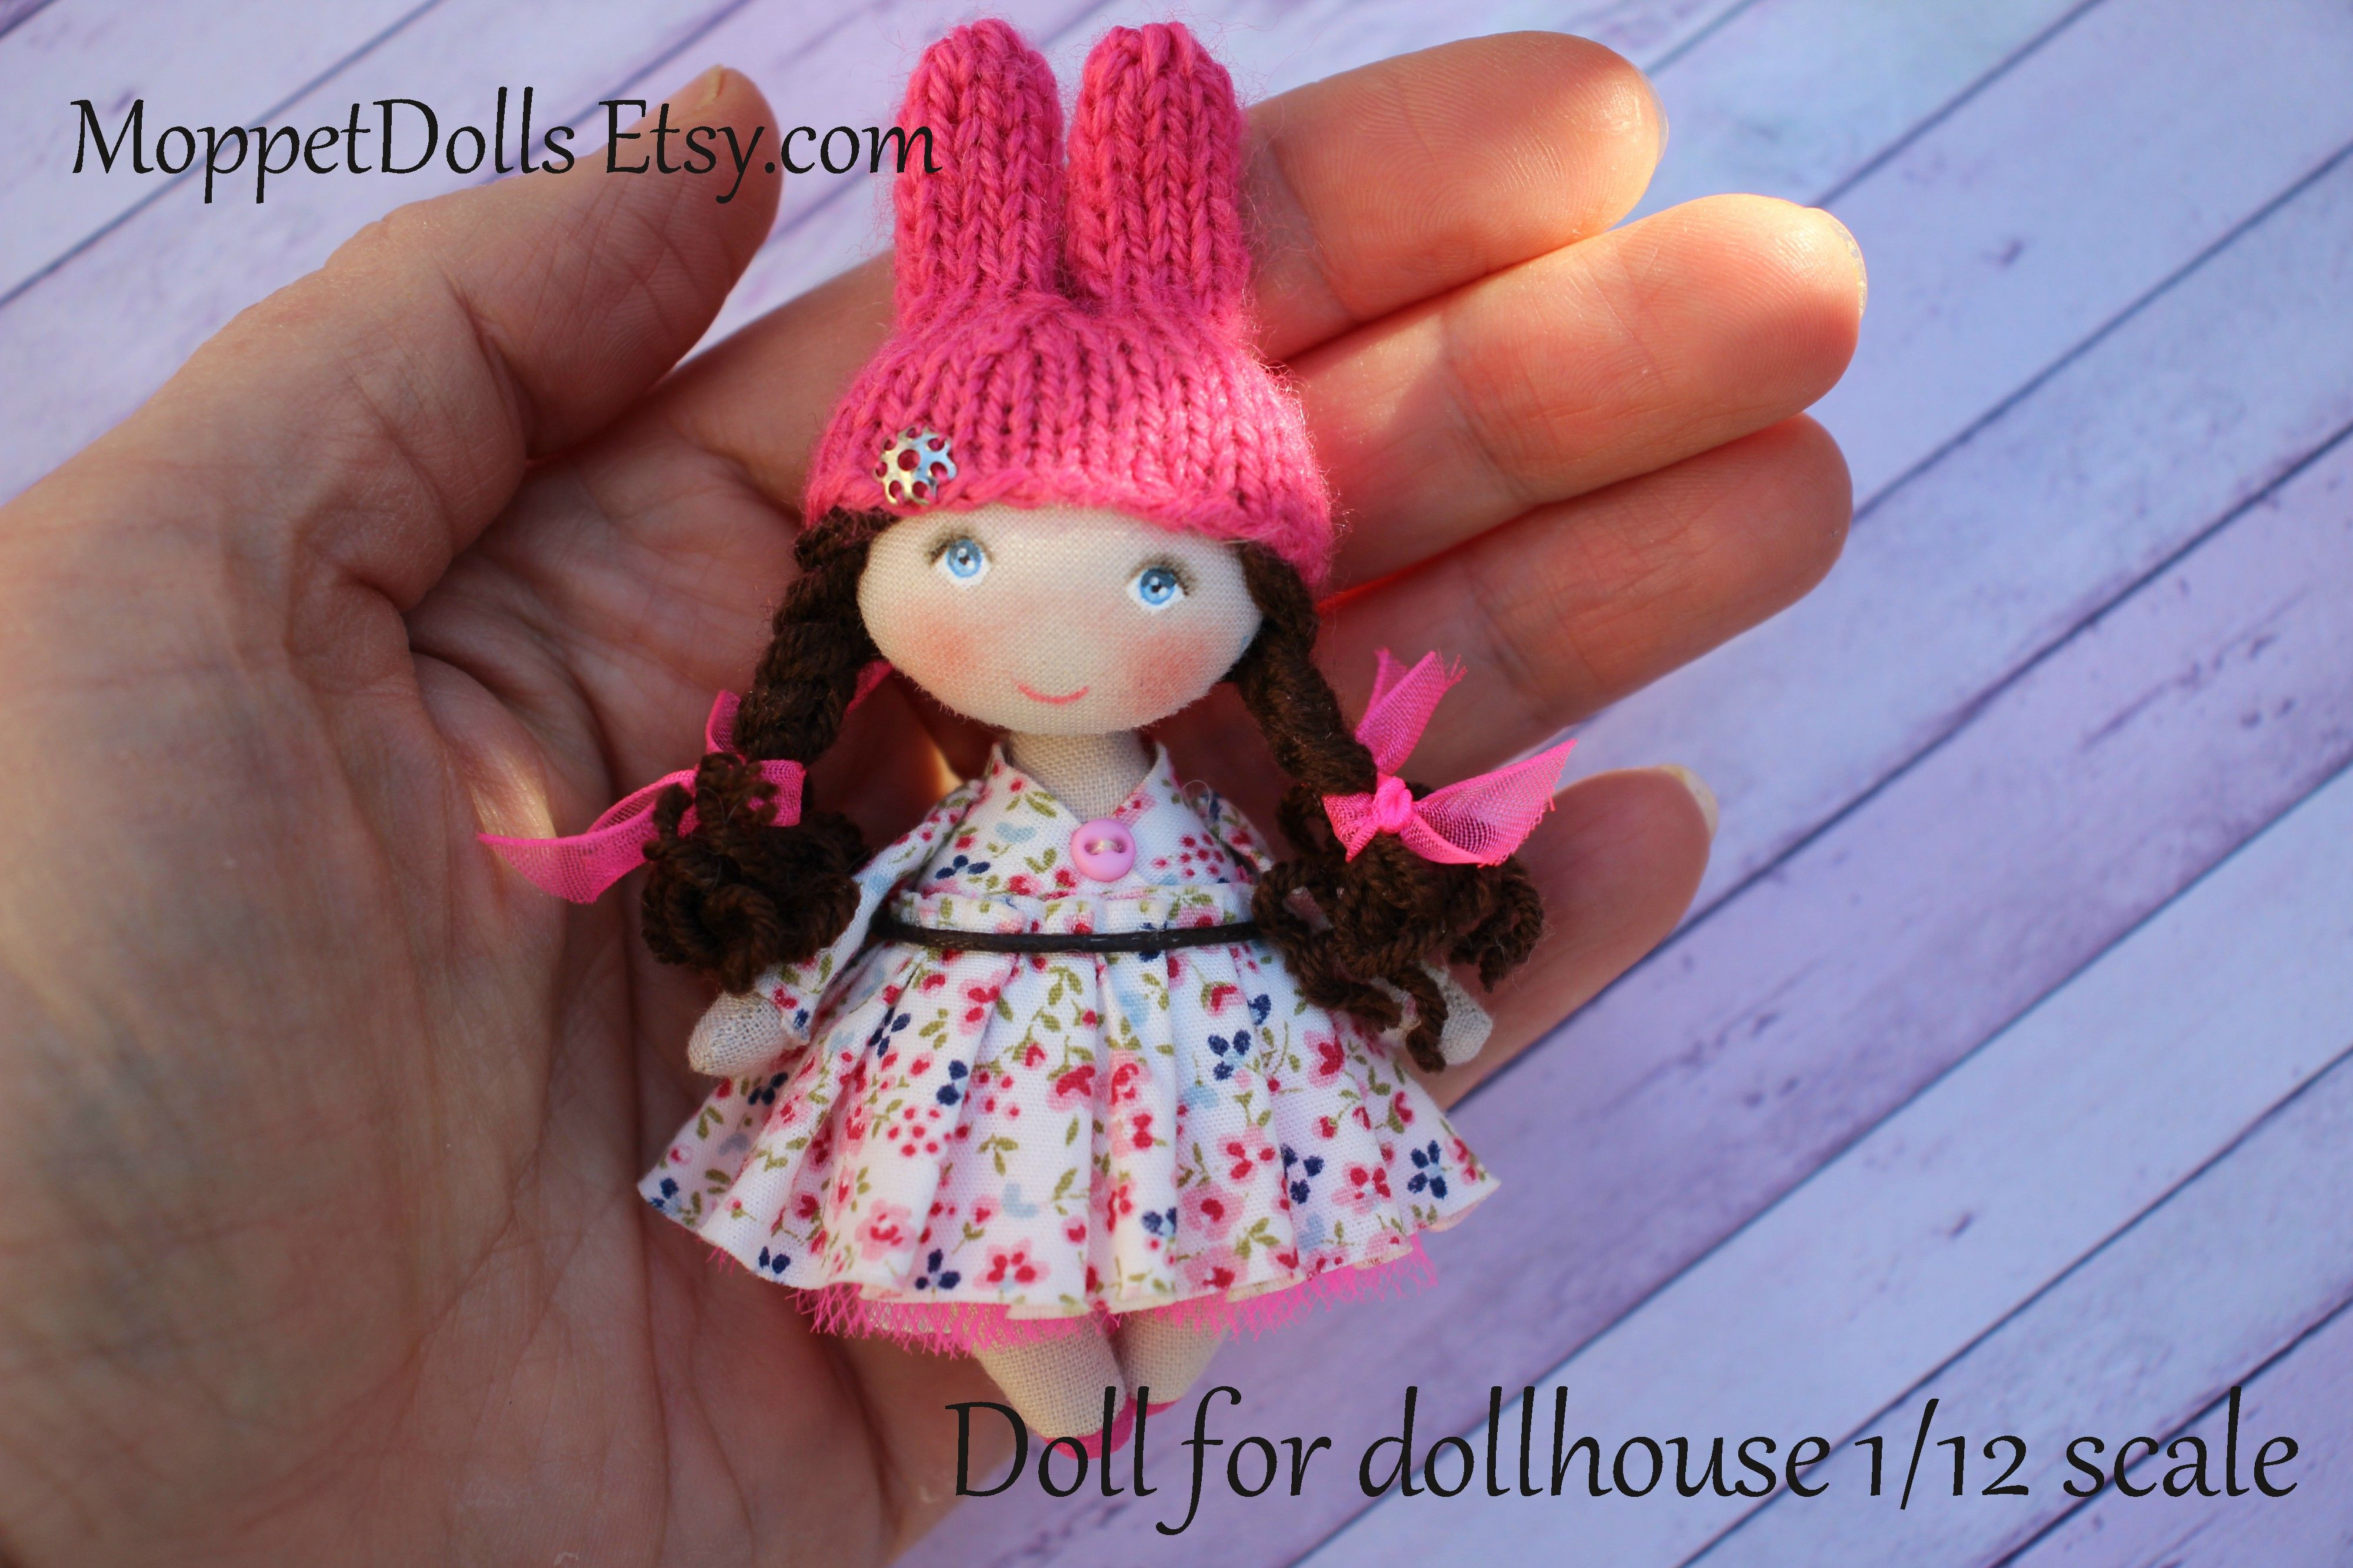 Dollhouse accessory miniature rabbit bunny doll mini fabric doll dollhouse accessory miniature rabbit bunny doll mini fabric doll tiny cloth art doll negle Images